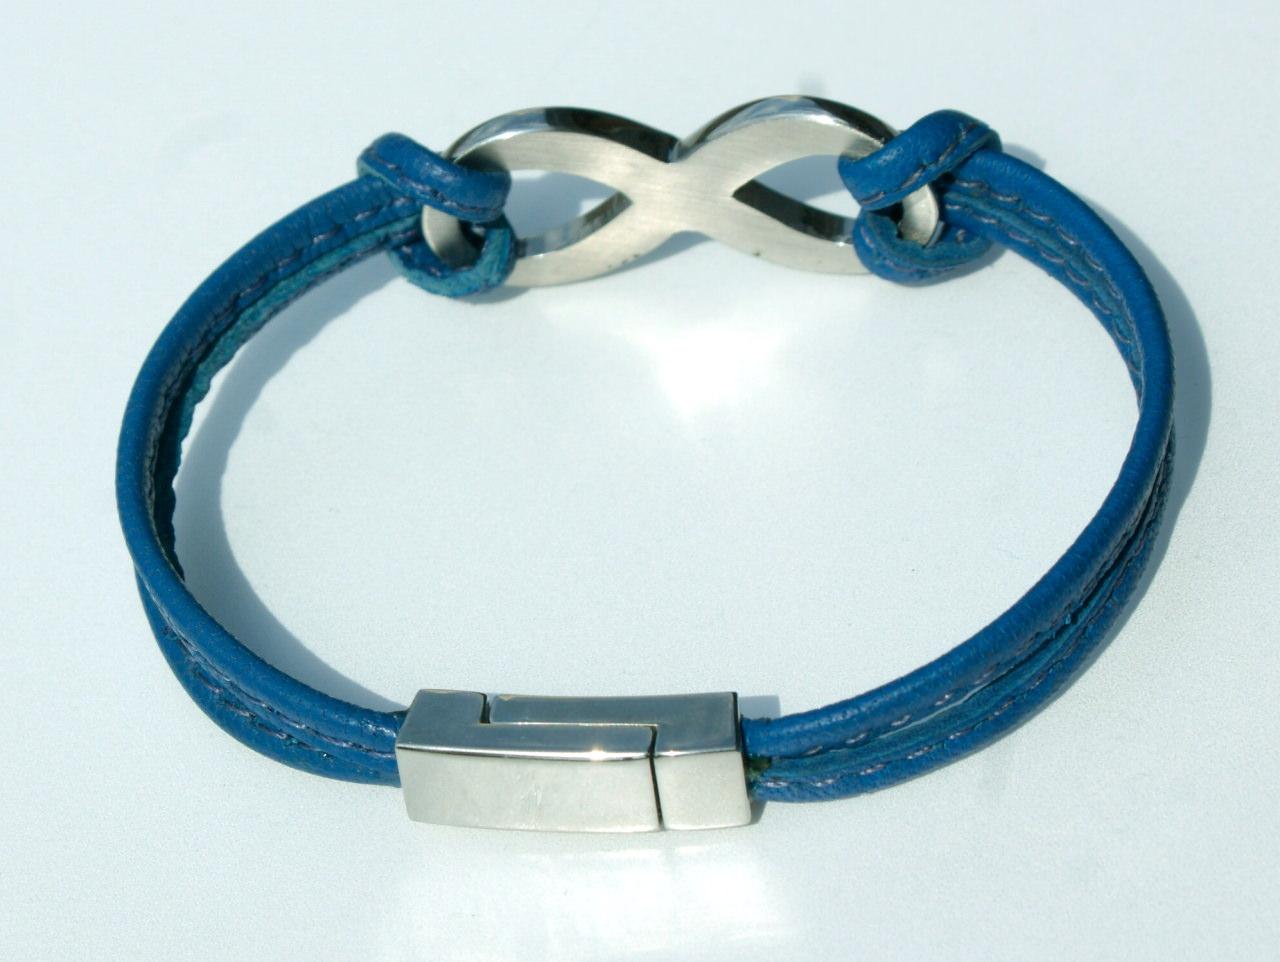 Kleinesbild - Armband INFINITY Nappa-Leder blau  Edelstahl